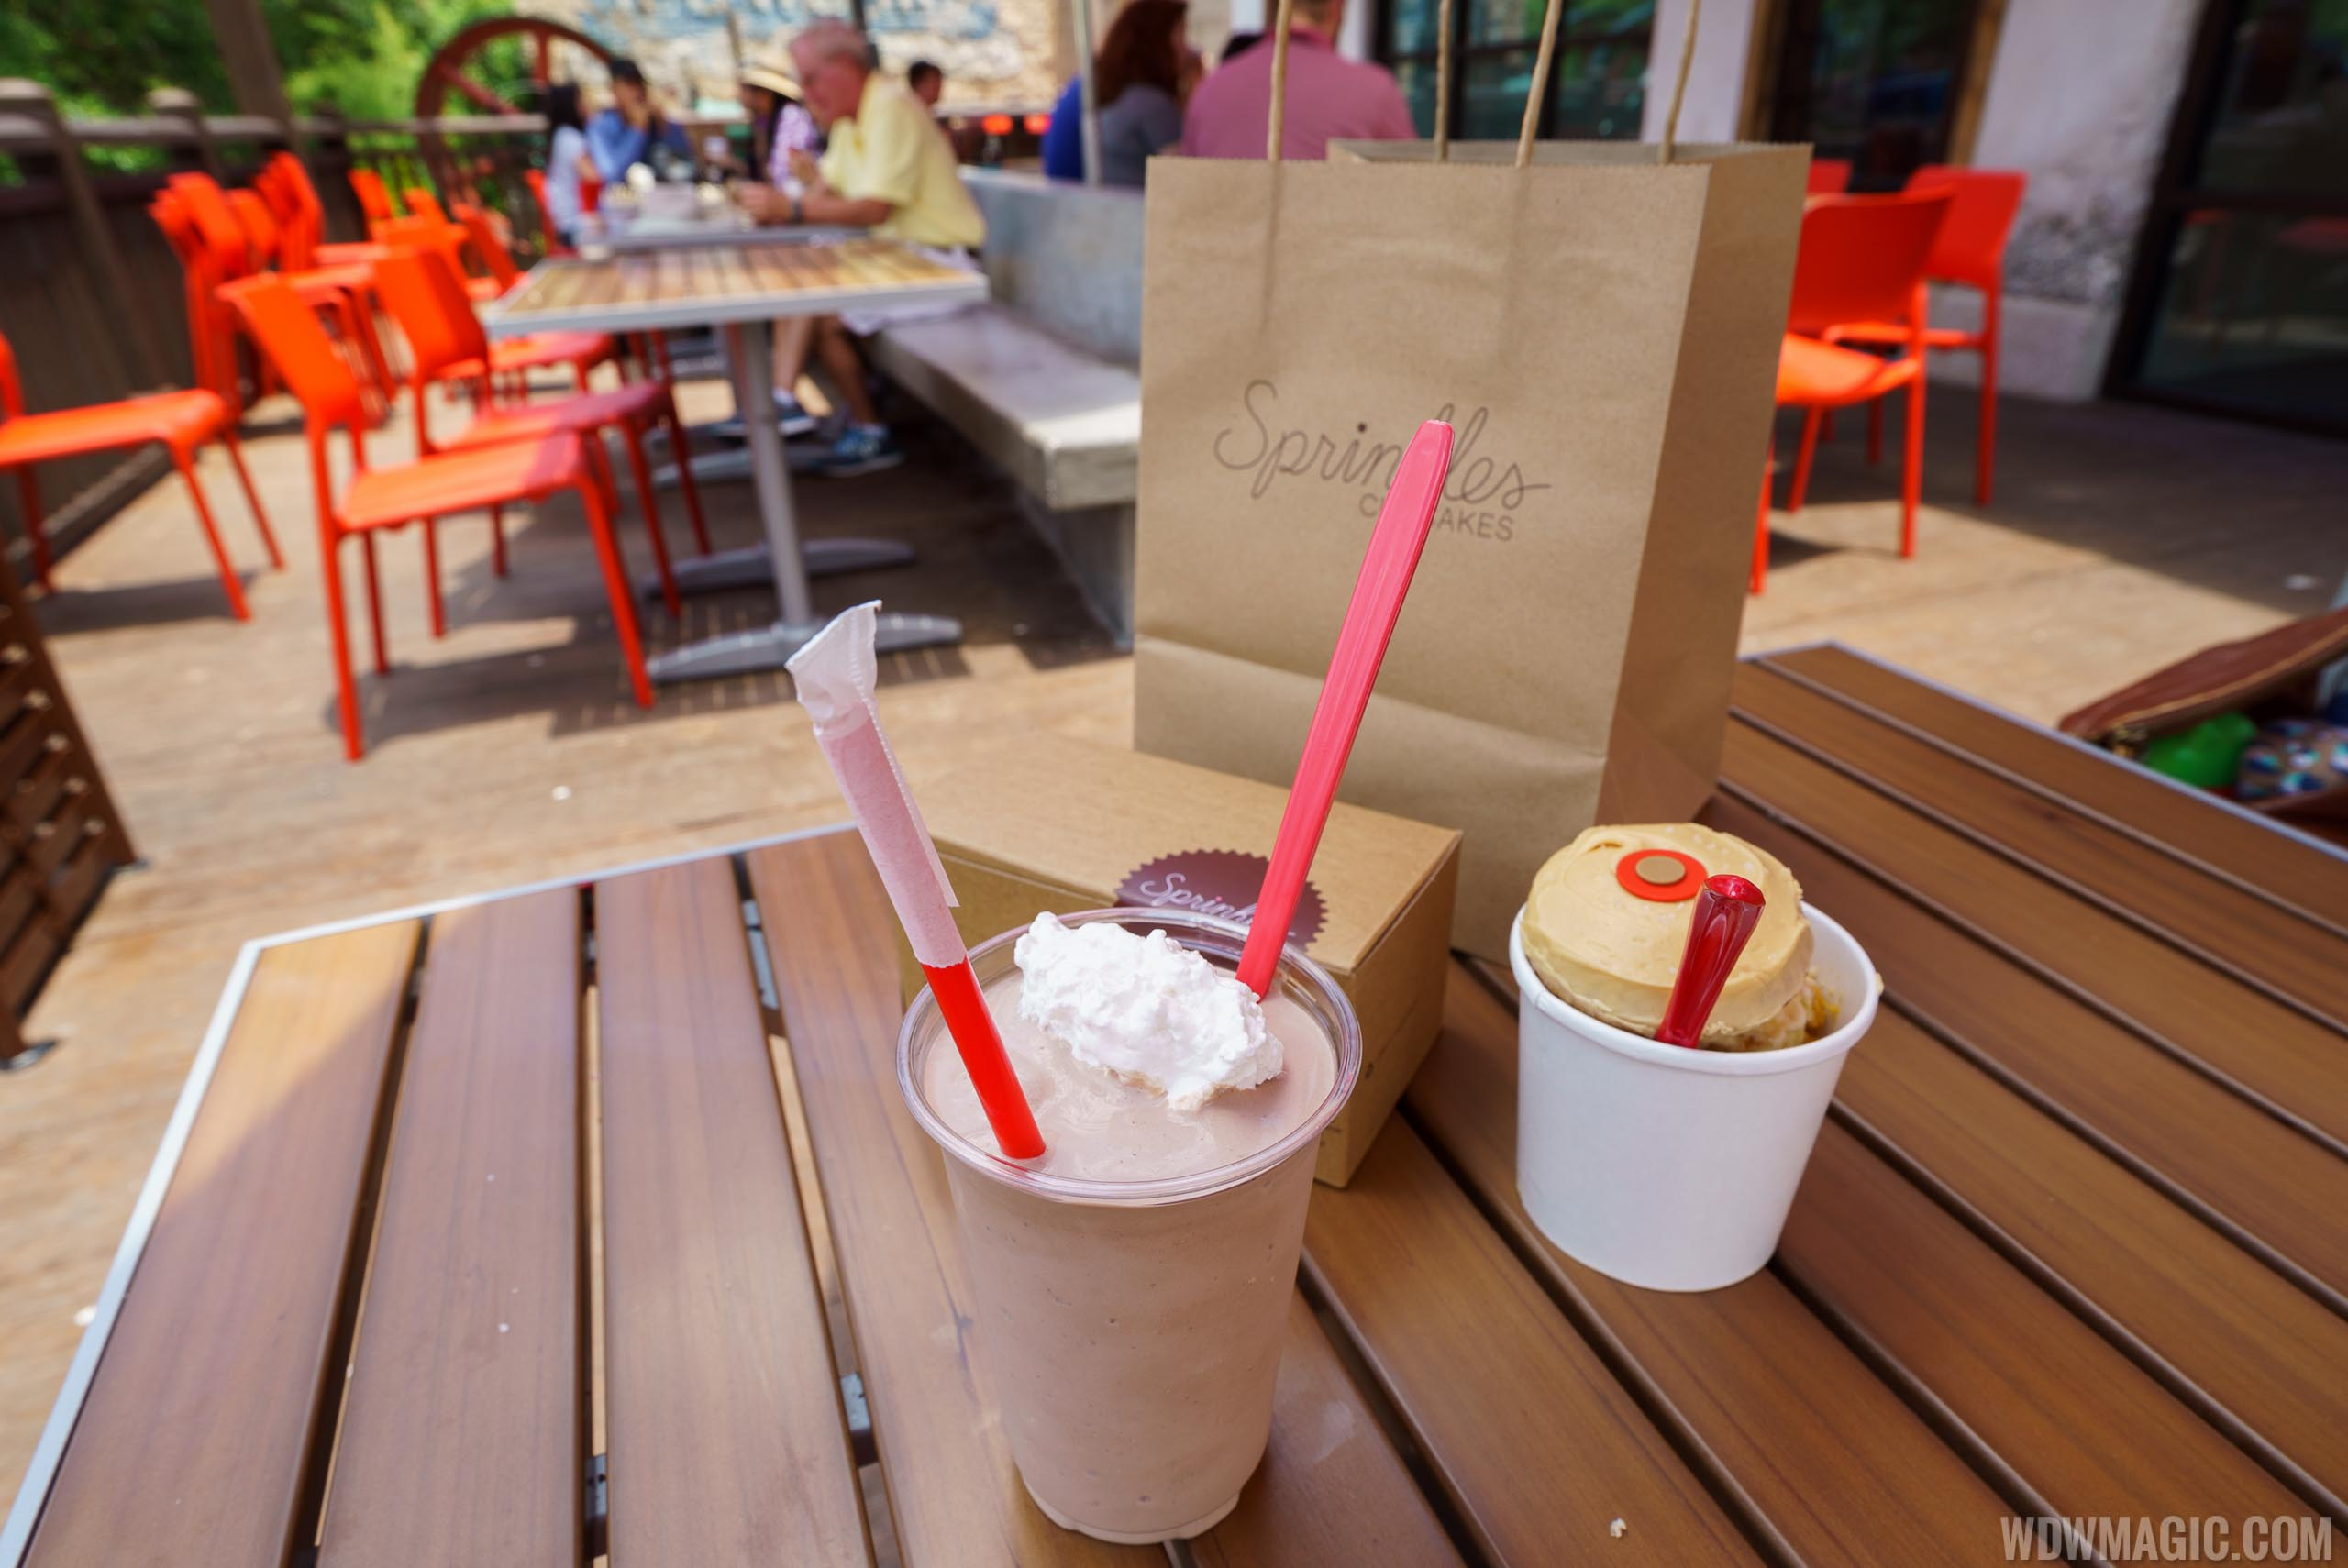 Sprinkles cupcakes, shakes and sundaes at Disney Springs